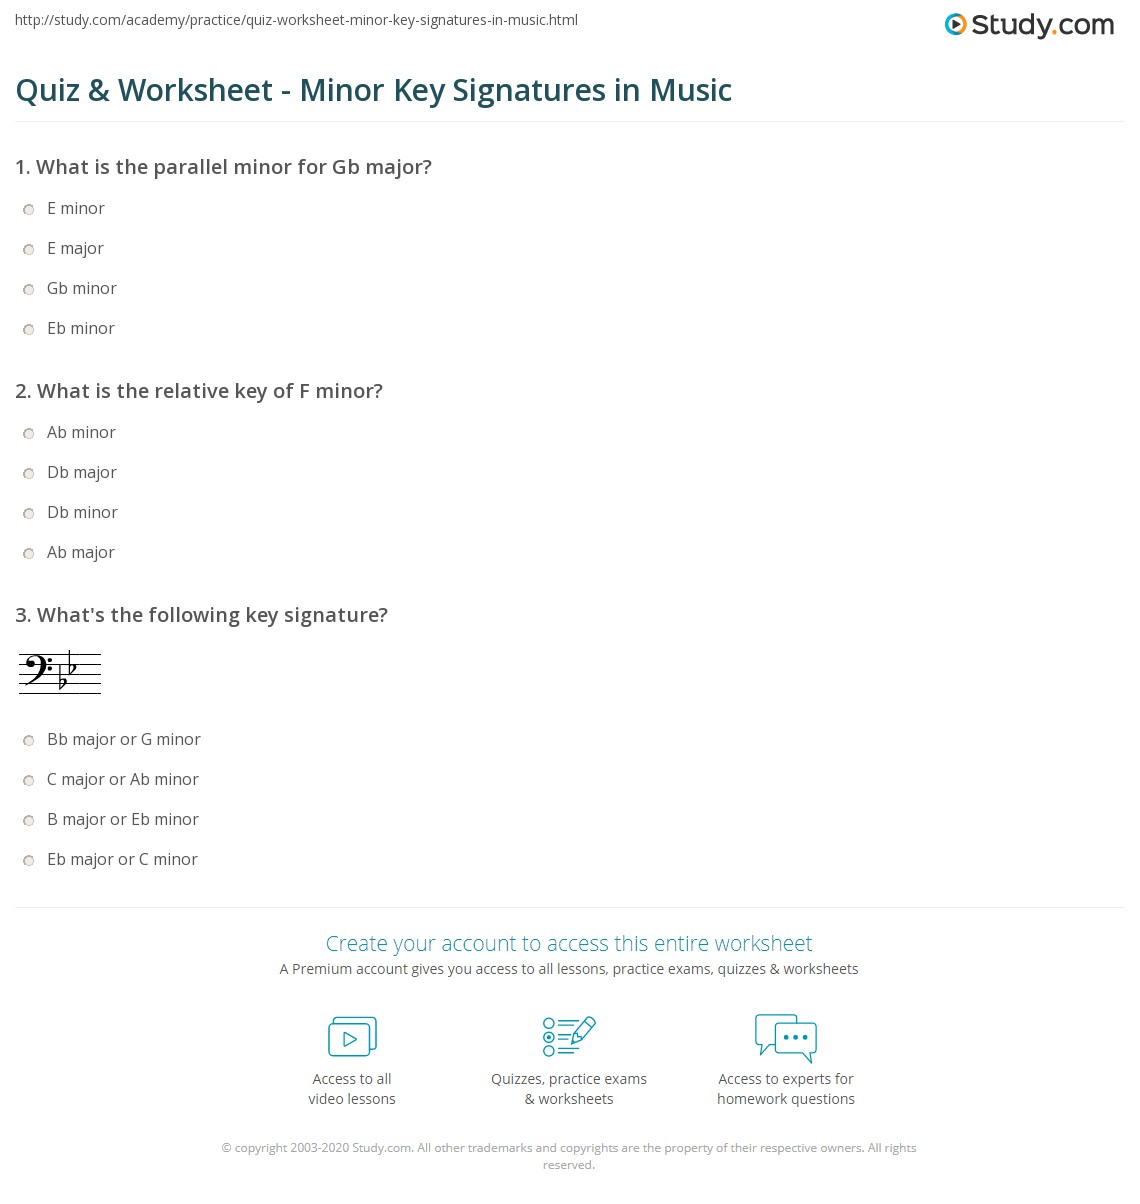 Quiz Worksheet Minor Key Signatures in Music – Key Signature Worksheets